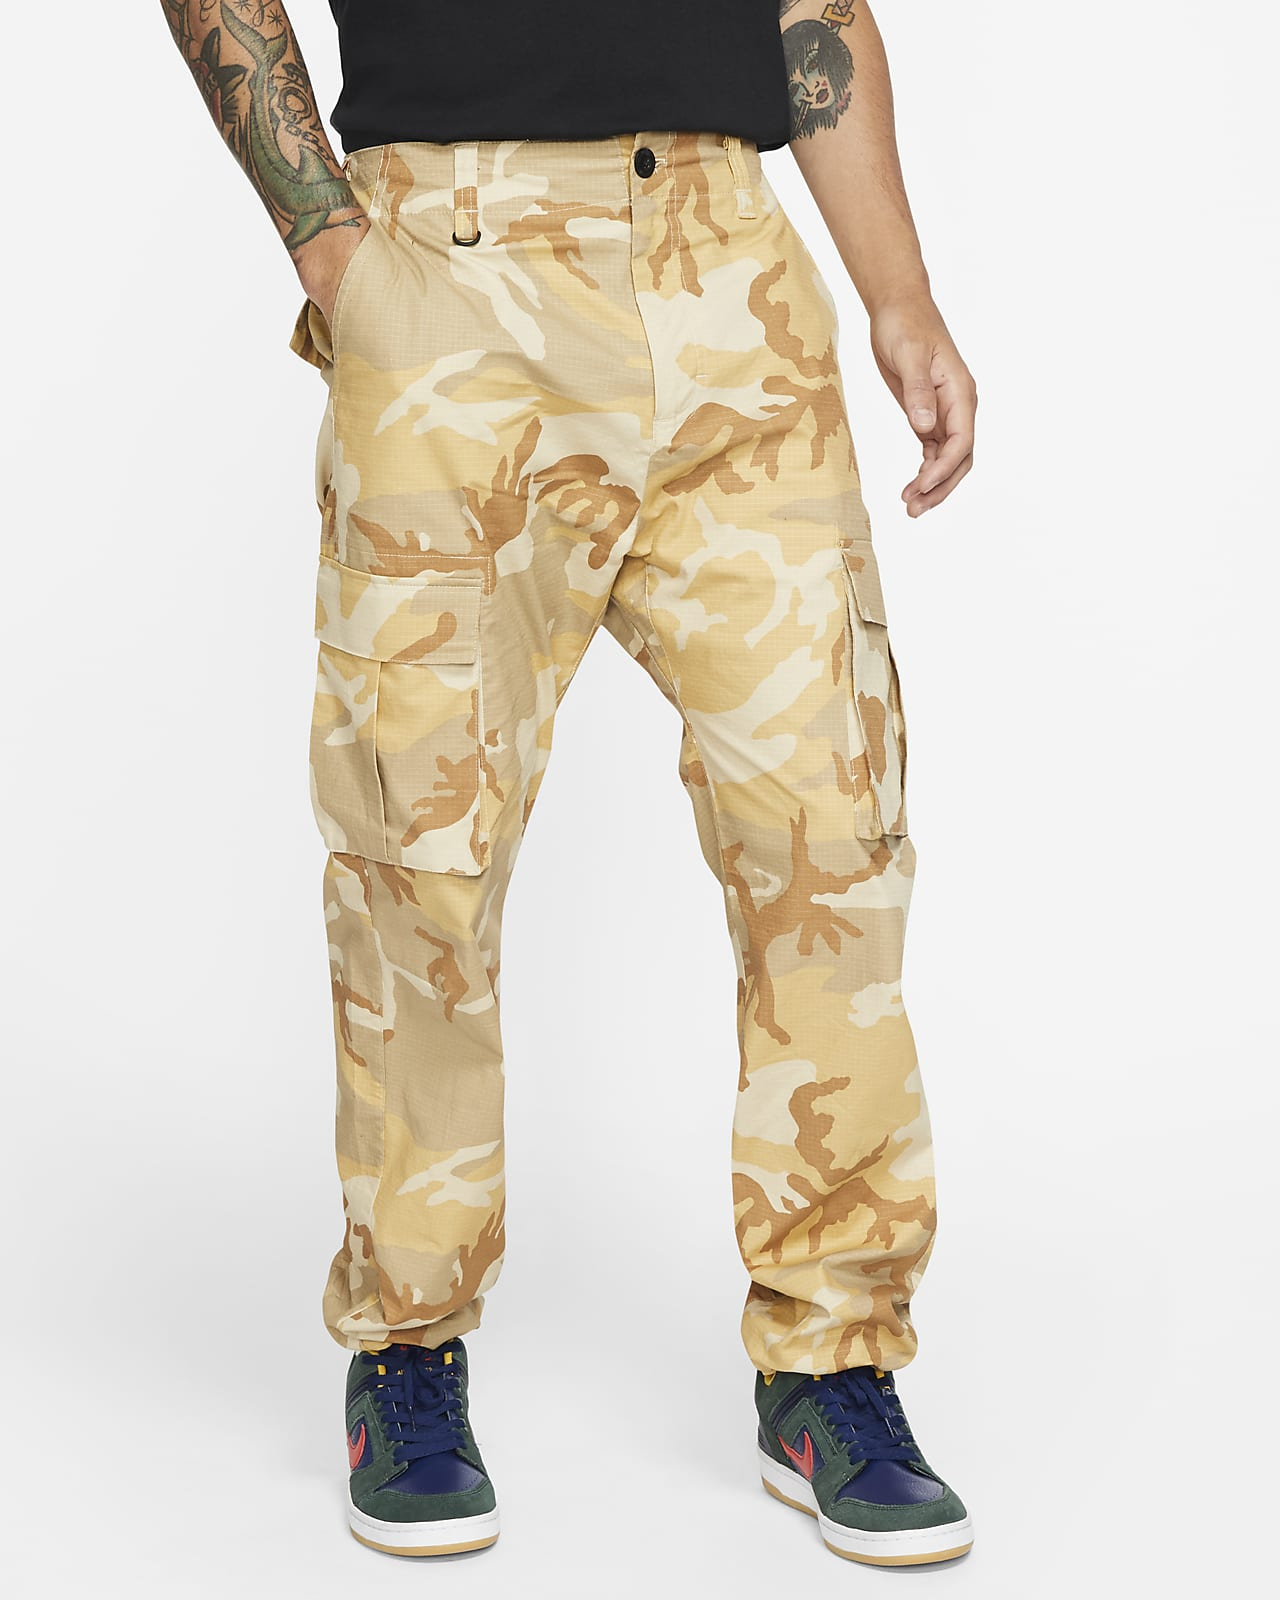 Nike SB Flex FTM Men's Camo Skate Cargo Pants